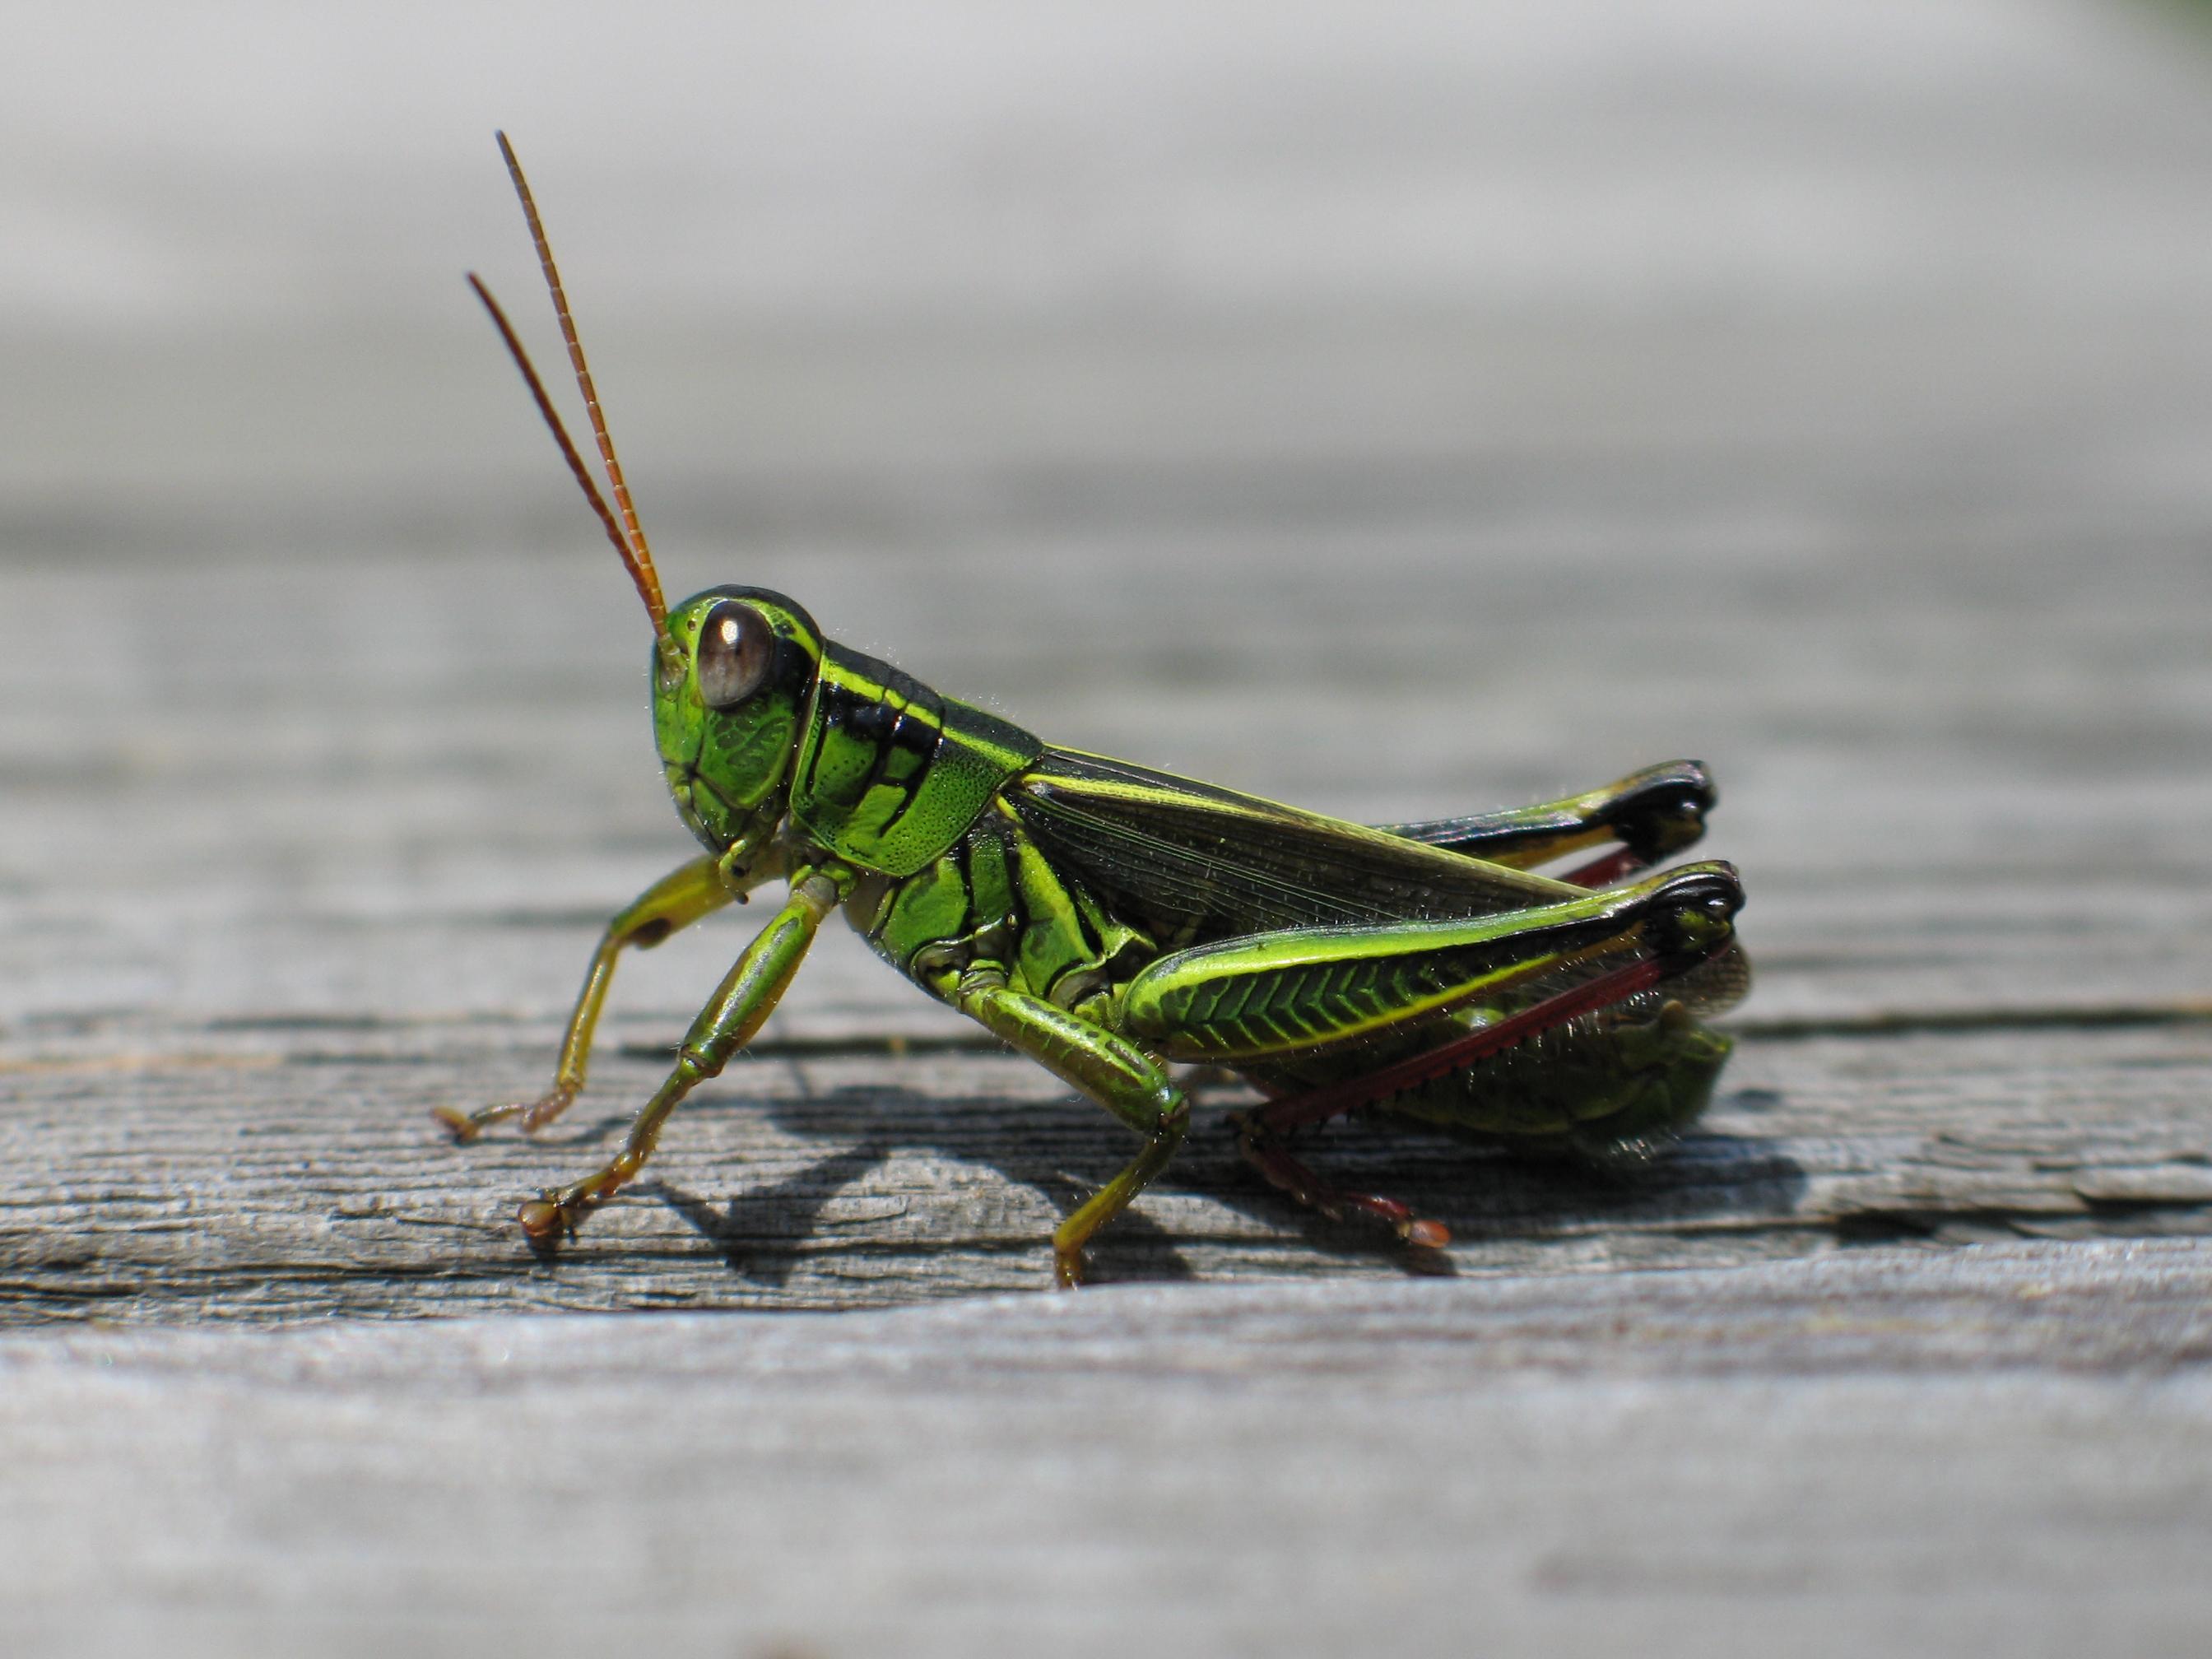 Http Www Grasshopperd Com Forum Topics Grasshopper Wind Simulation In A Room